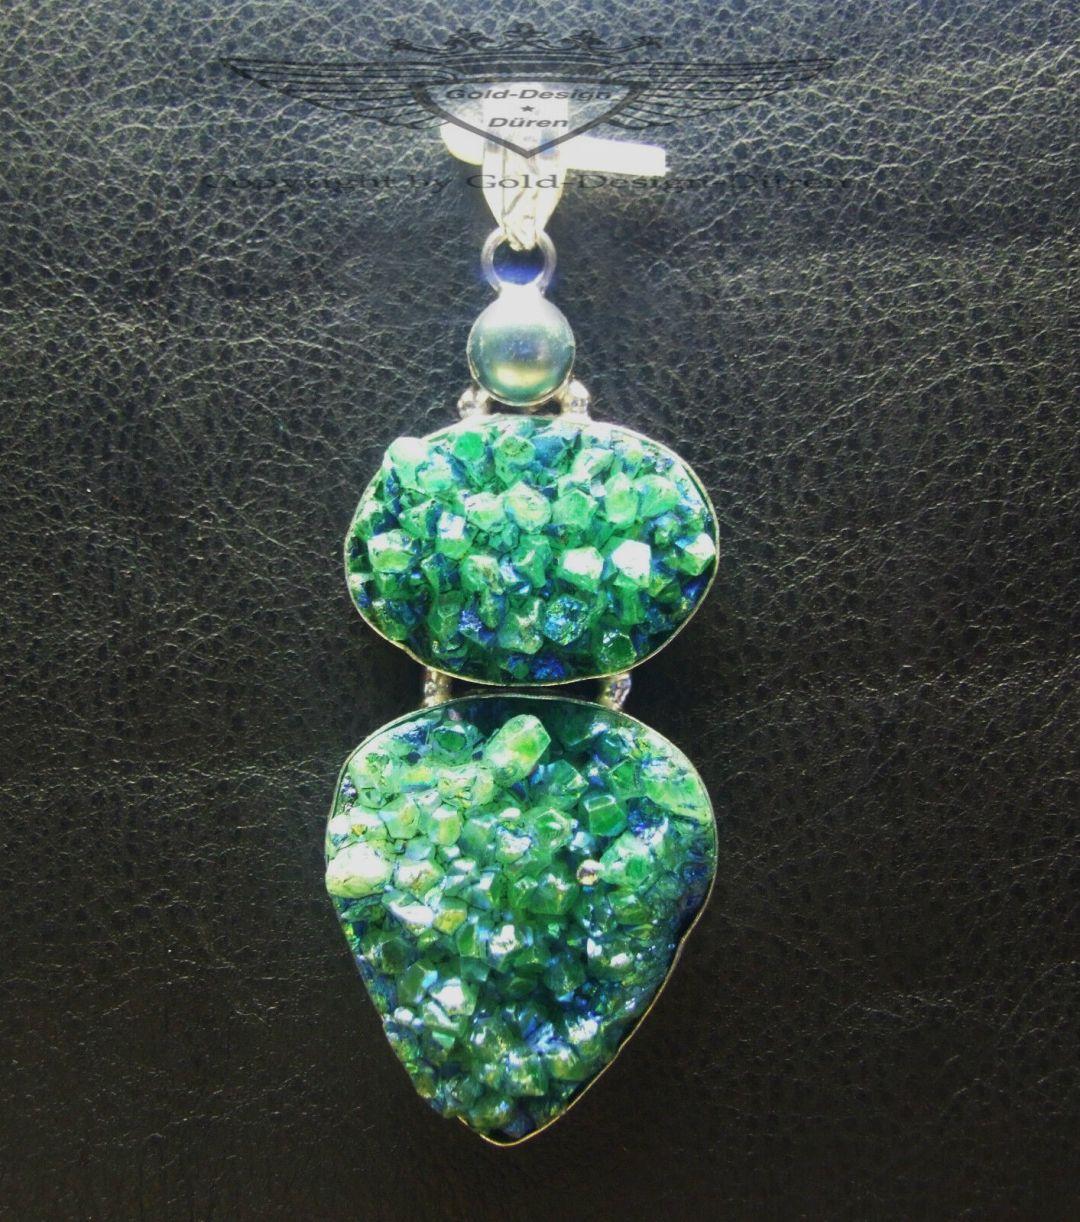 Kettenanhänger, Anhänger, Blau- Grün mehrfarbig, Titanium Druse, 925 Silber